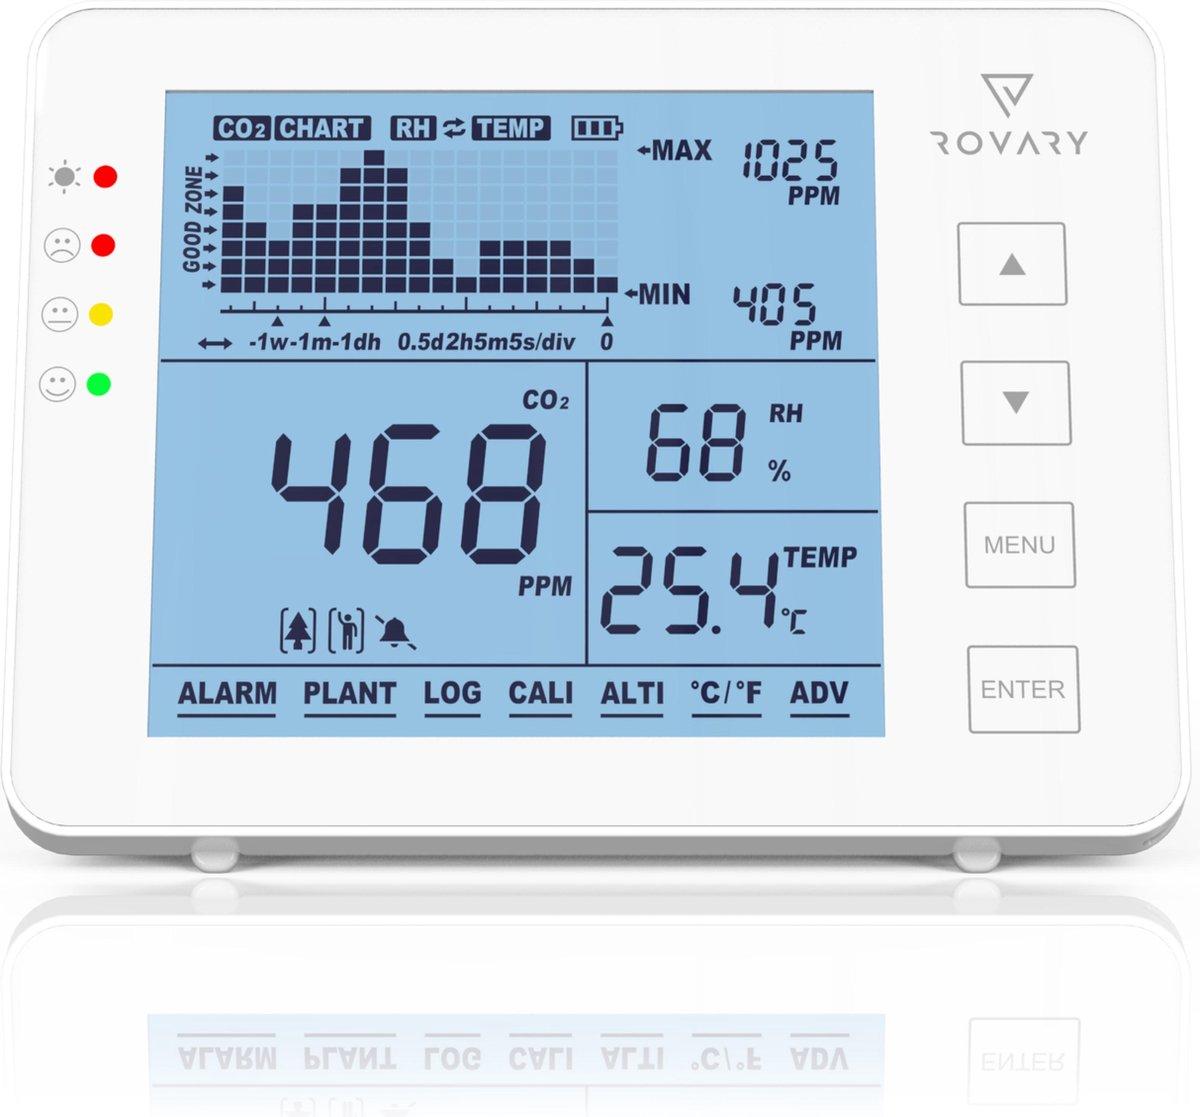 CO2 - meter